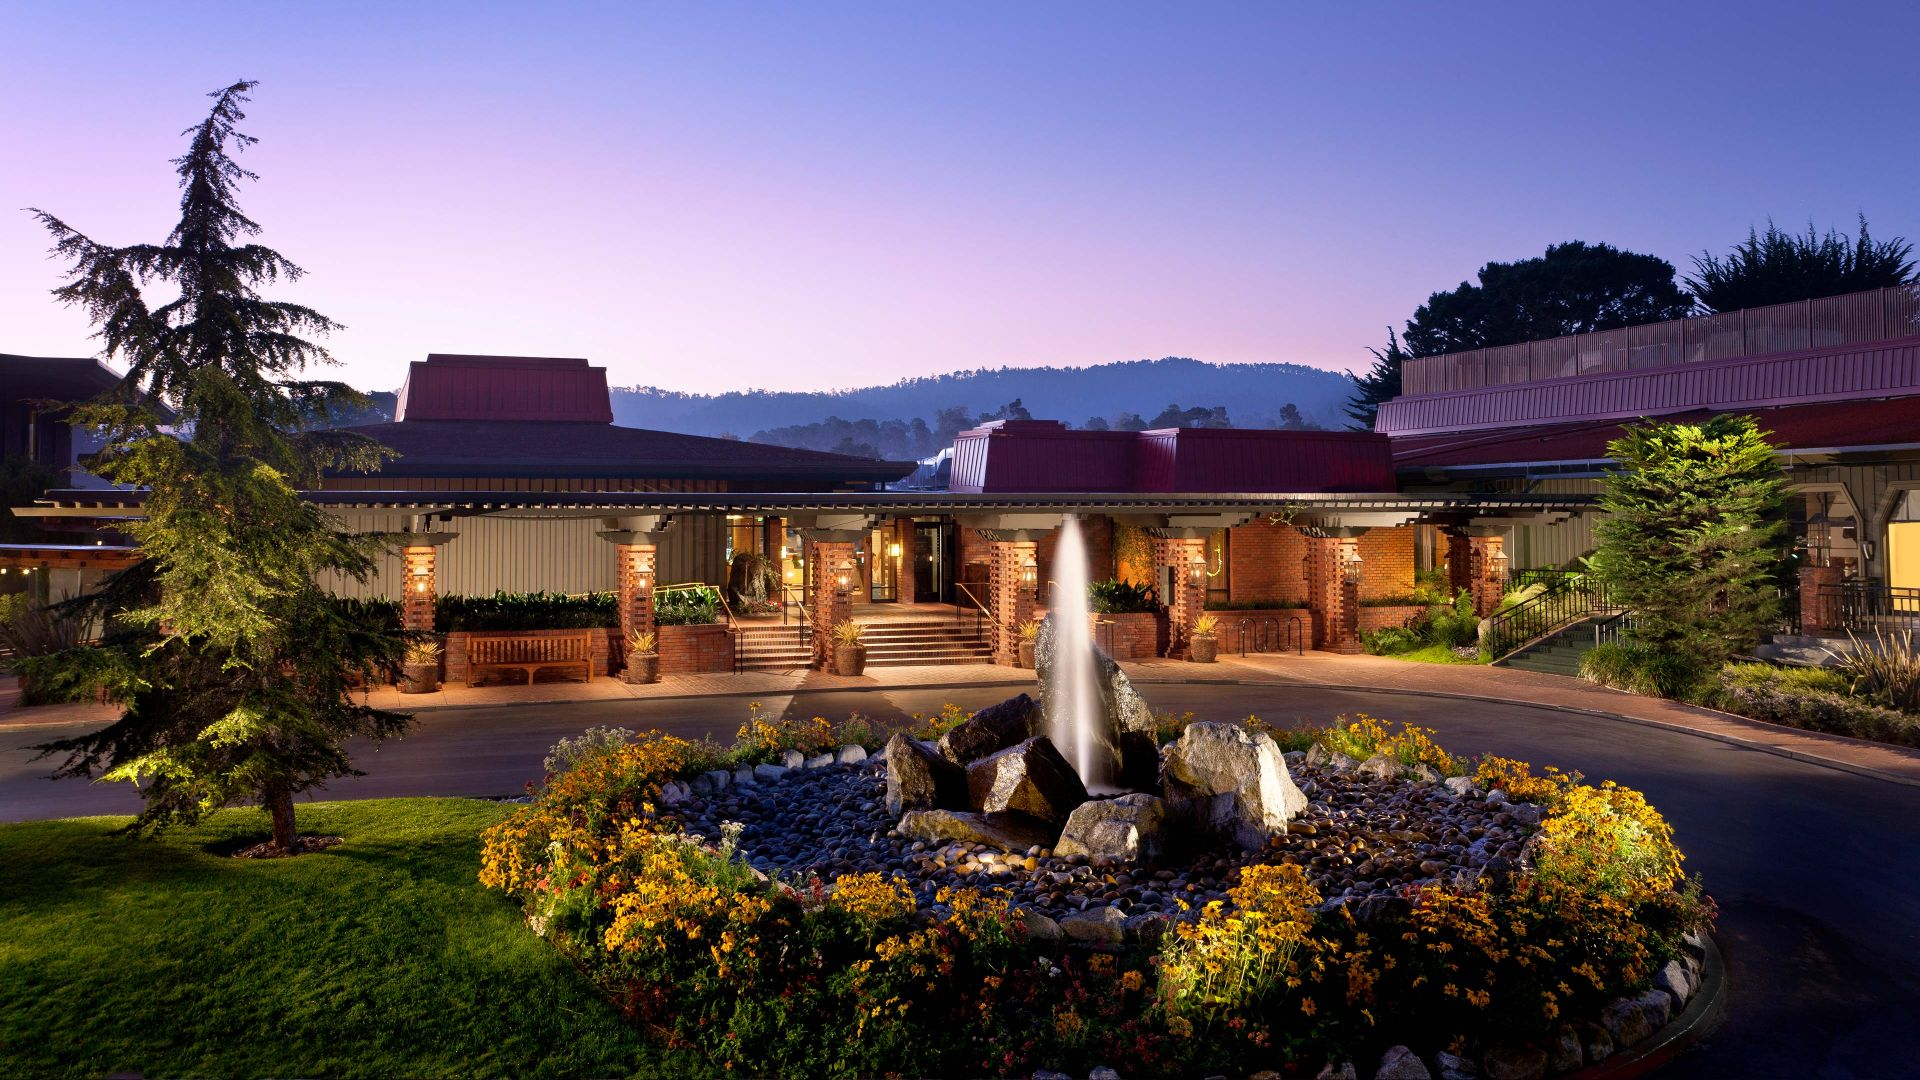 Hyatt-Regency-Monterey-Hotel-and-Spa-on-Del-Monte-Gold-Course-P146-Exterior.adapt.16x9.1920.1080.jpg